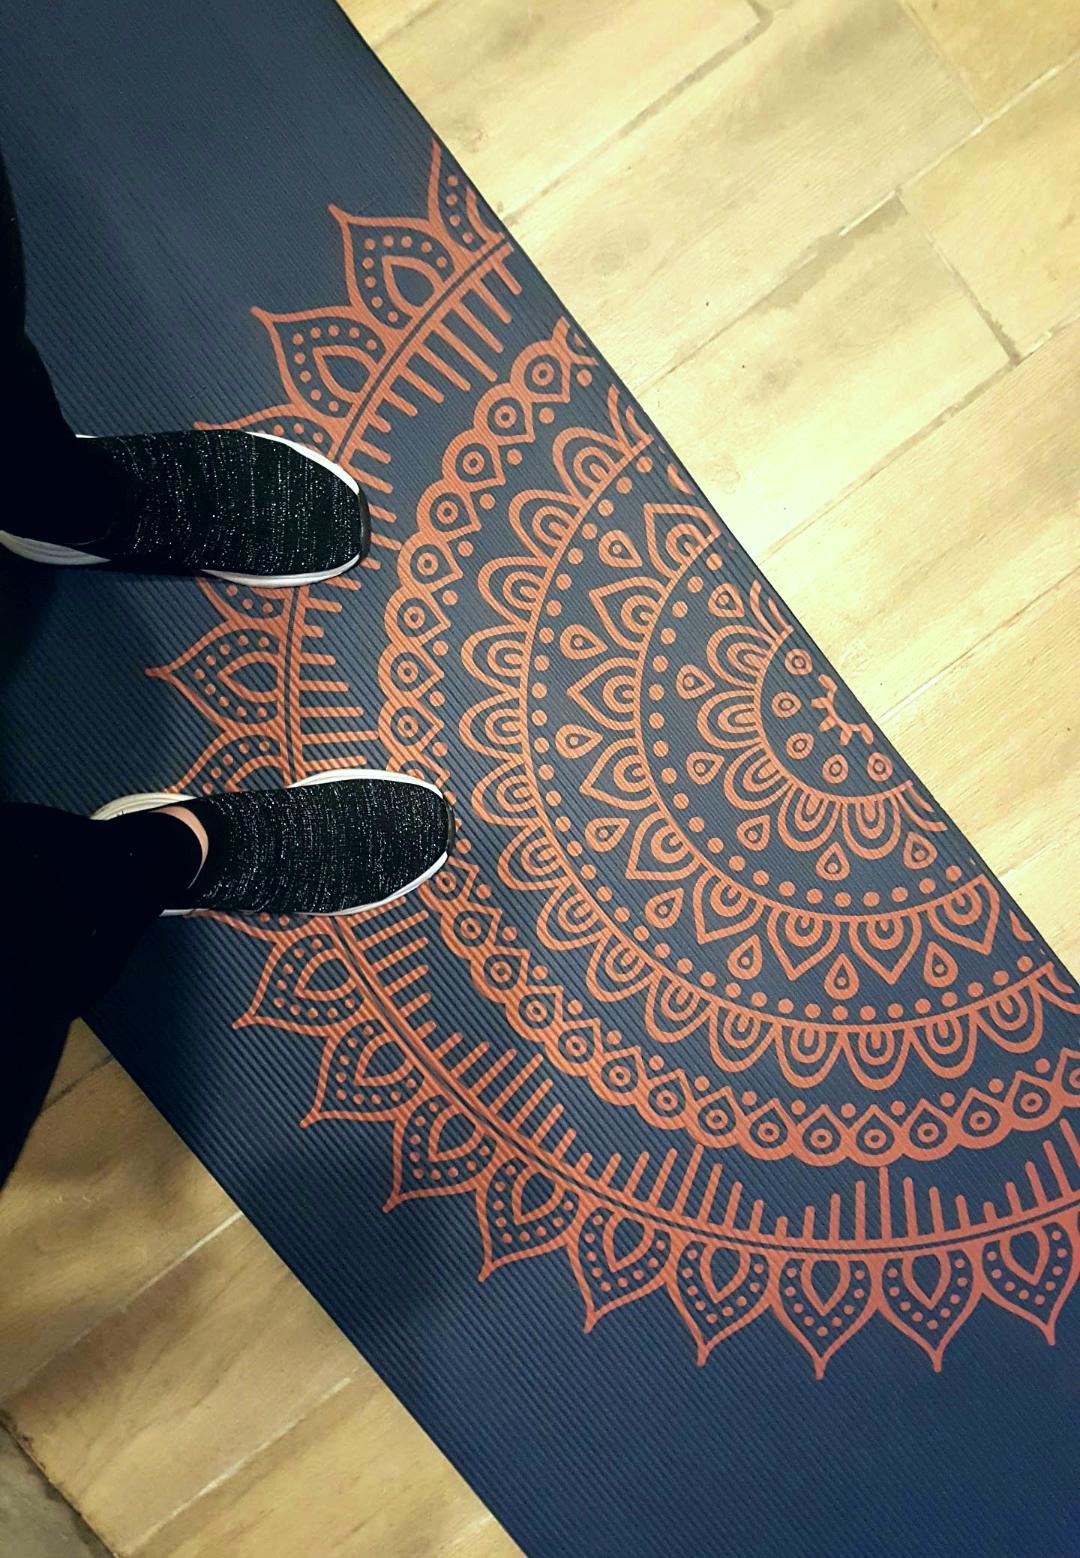 Boho chic travel, gym mat and having fun with yoga